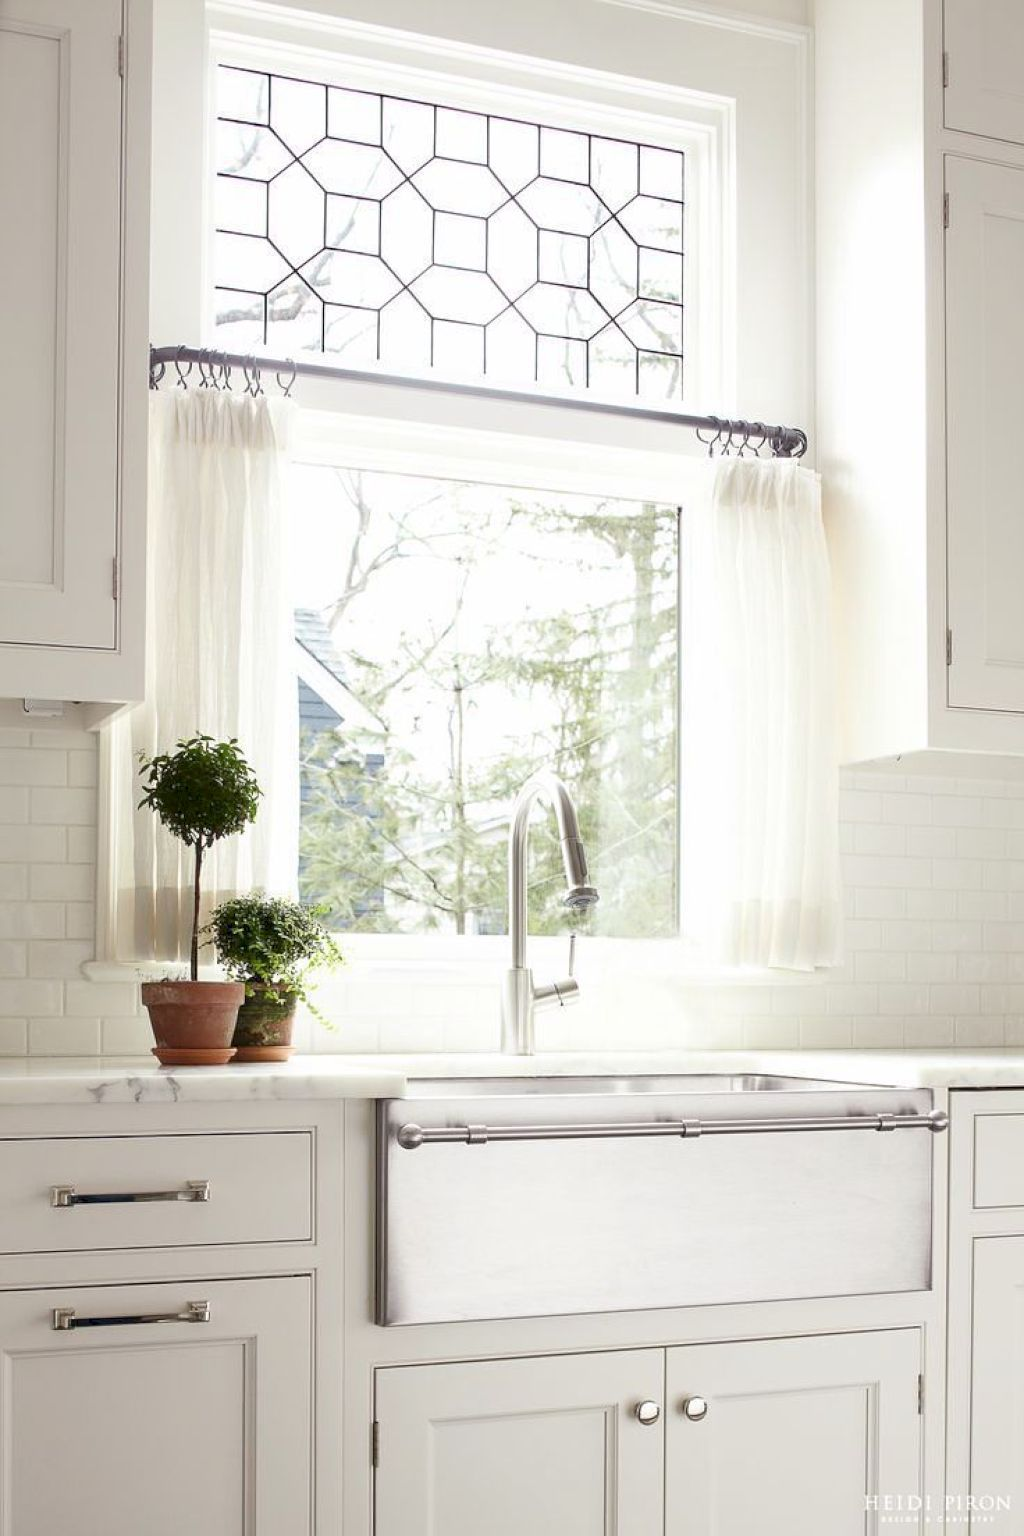 adorable 35 modern farmhouse kitchen decor ideas kitchen window curtains kitchen sink window on farmhouse kitchen window id=49112